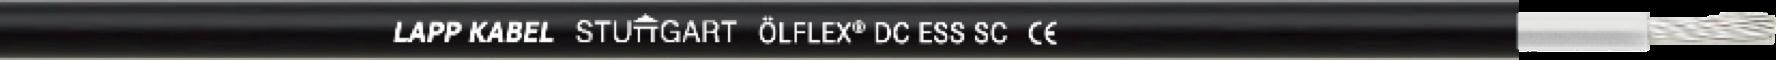 ÖLFLEX® DC ESS SC